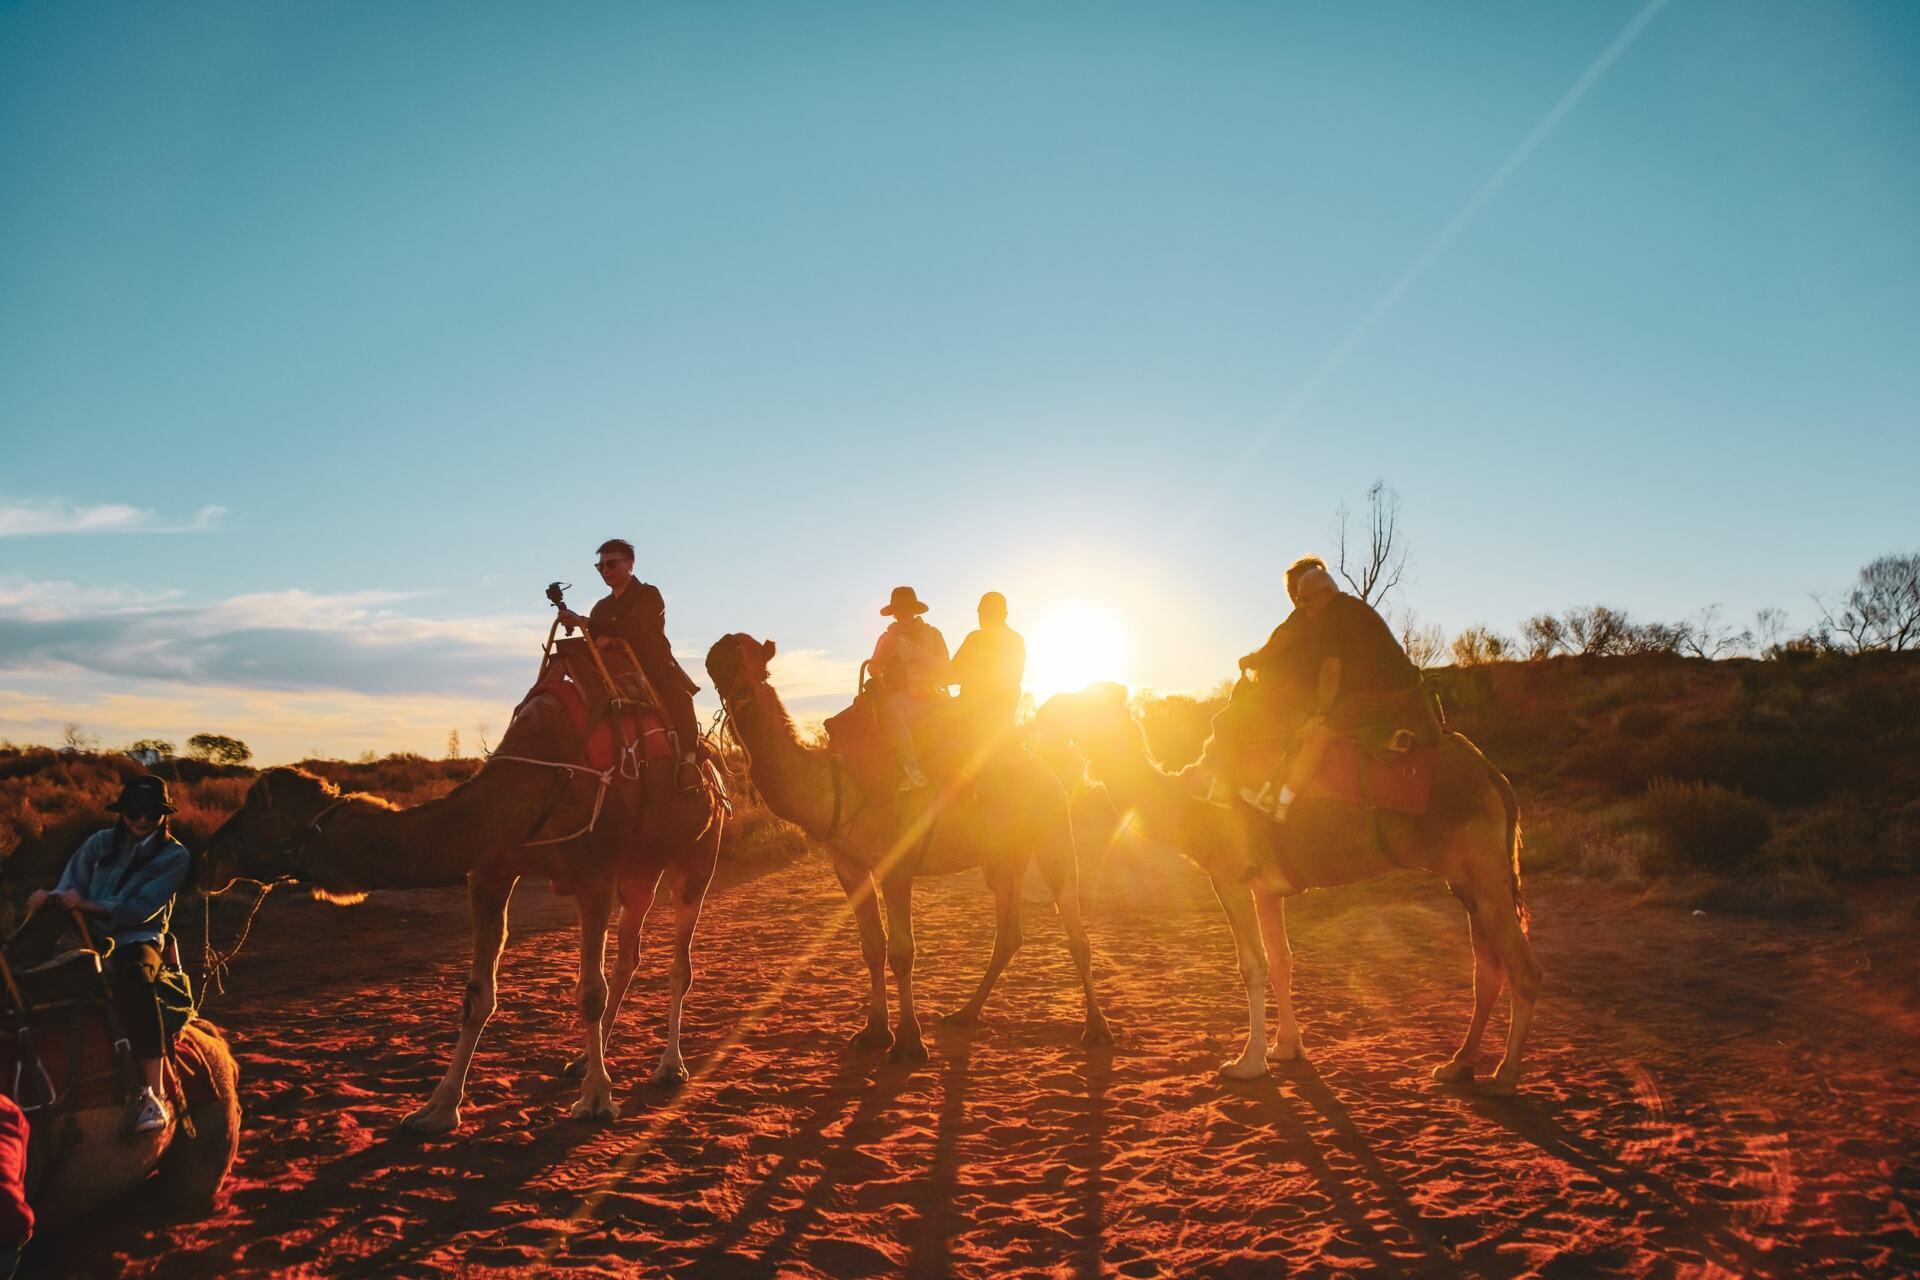 field of light by camel